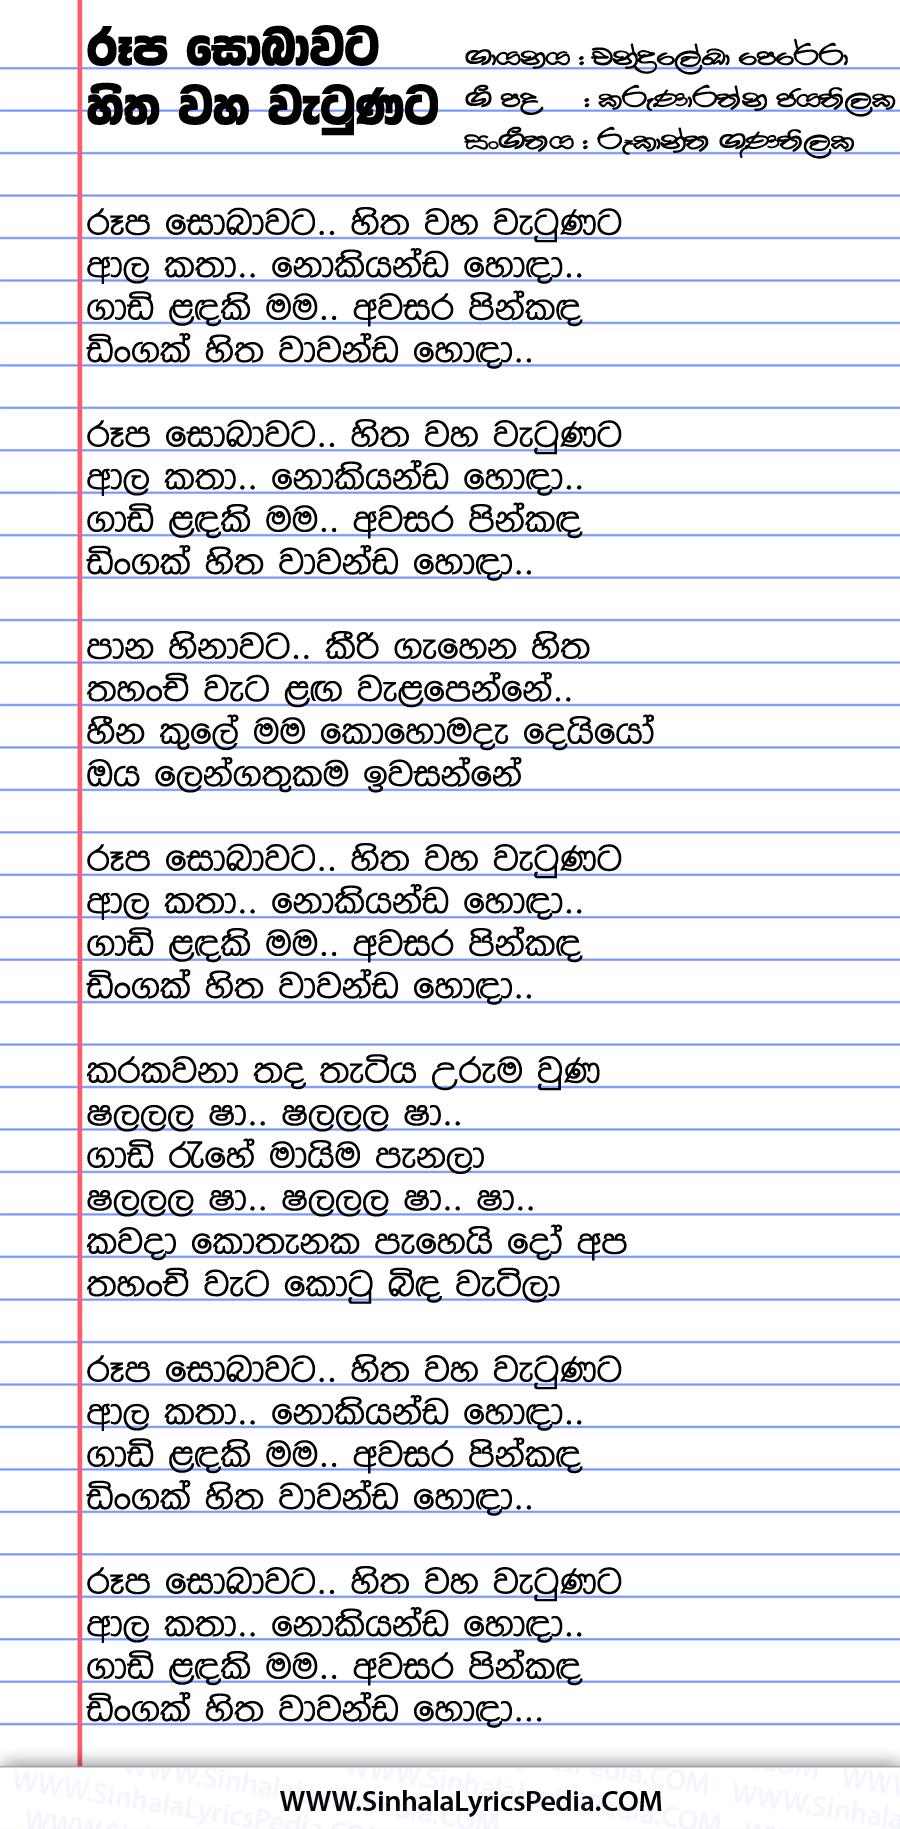 Roopa Sobawata Hitha Waha Watunata Song Lyrics